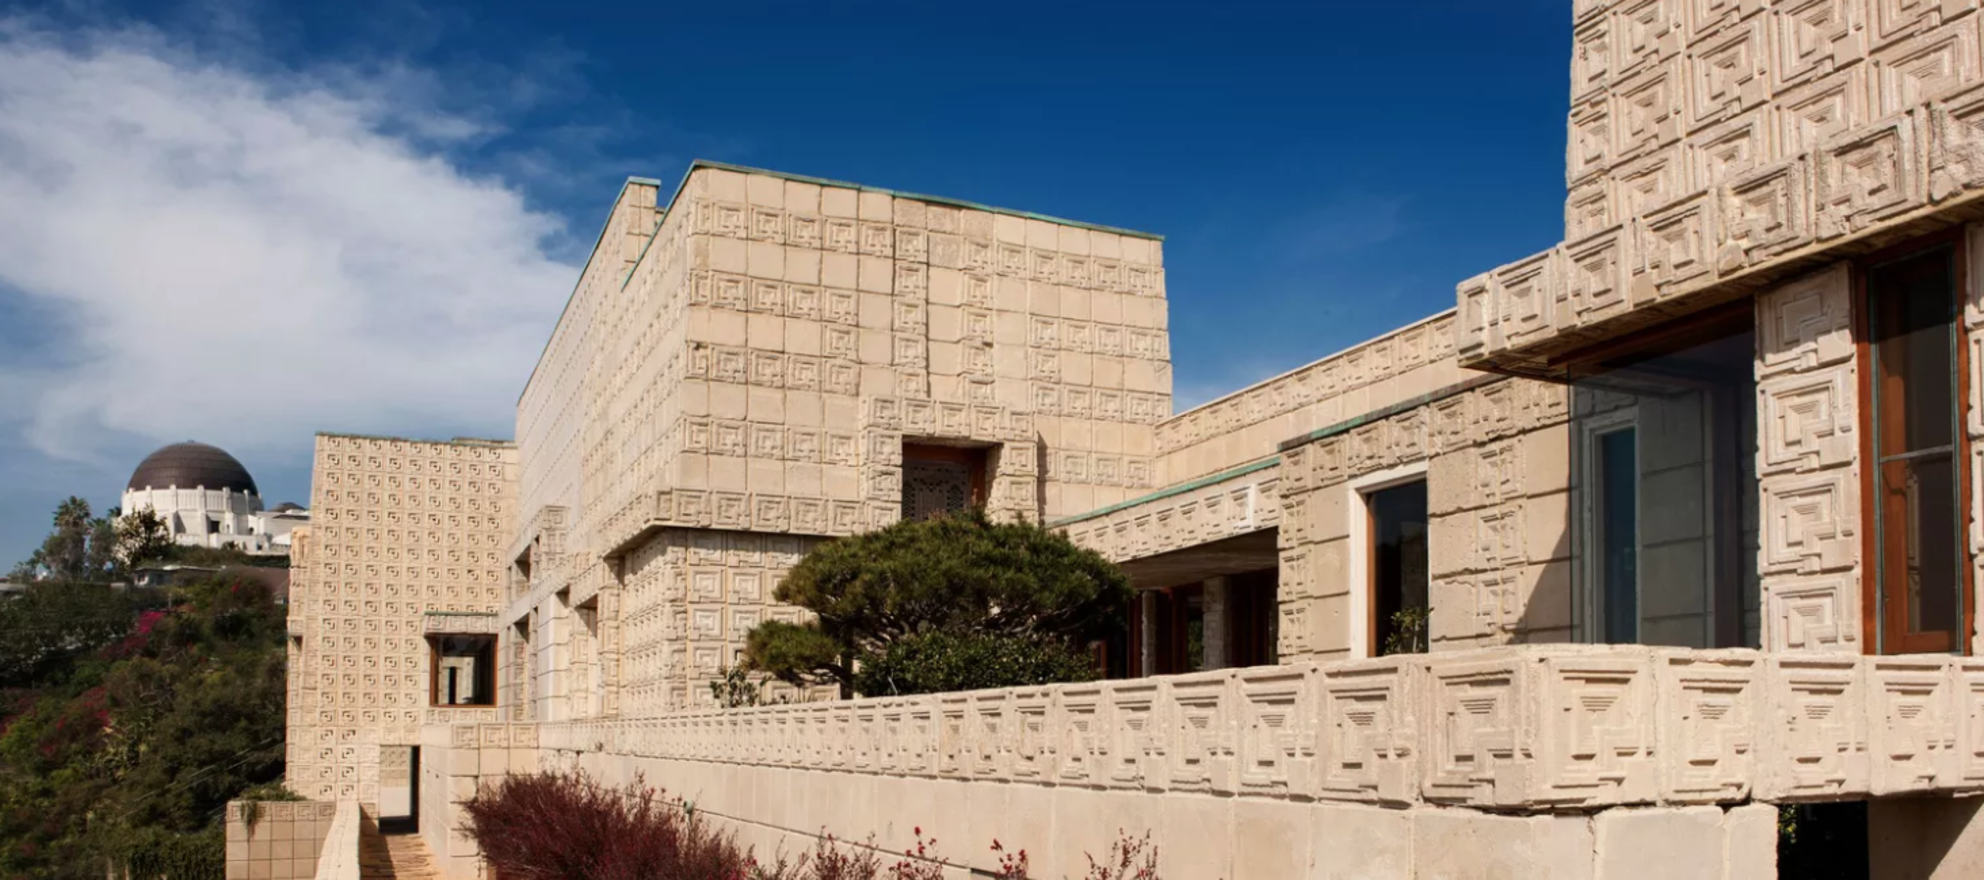 Frank Lloyd Wright Inspired Houses tour frank lloyd wright mayan-inspired $23m mansion - inman